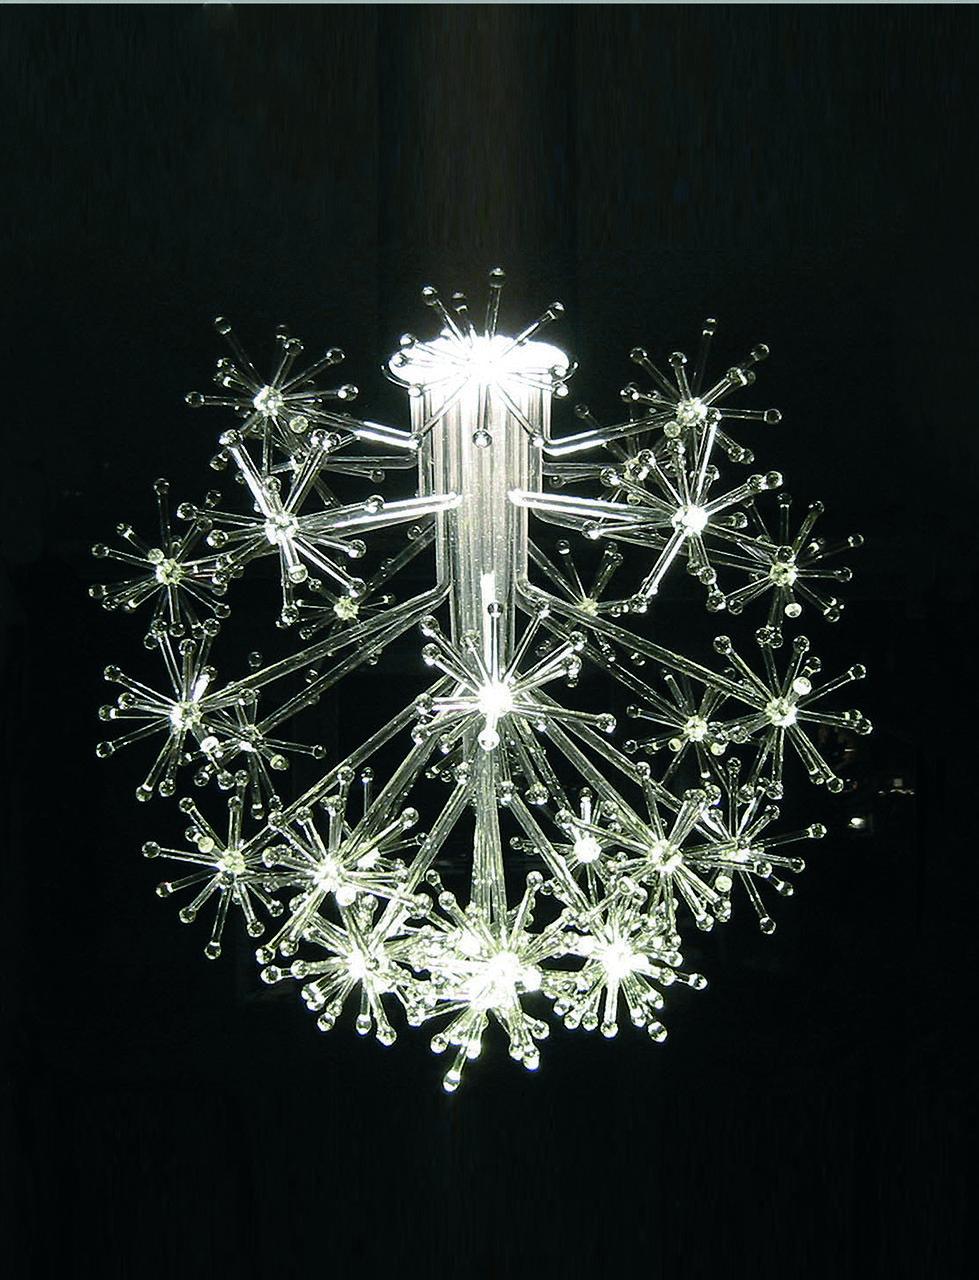 Lech bespoke chandelier for privat house isabel hamm licht lech bespoke chandelier for privat house isabel hamm licht arubaitofo Images